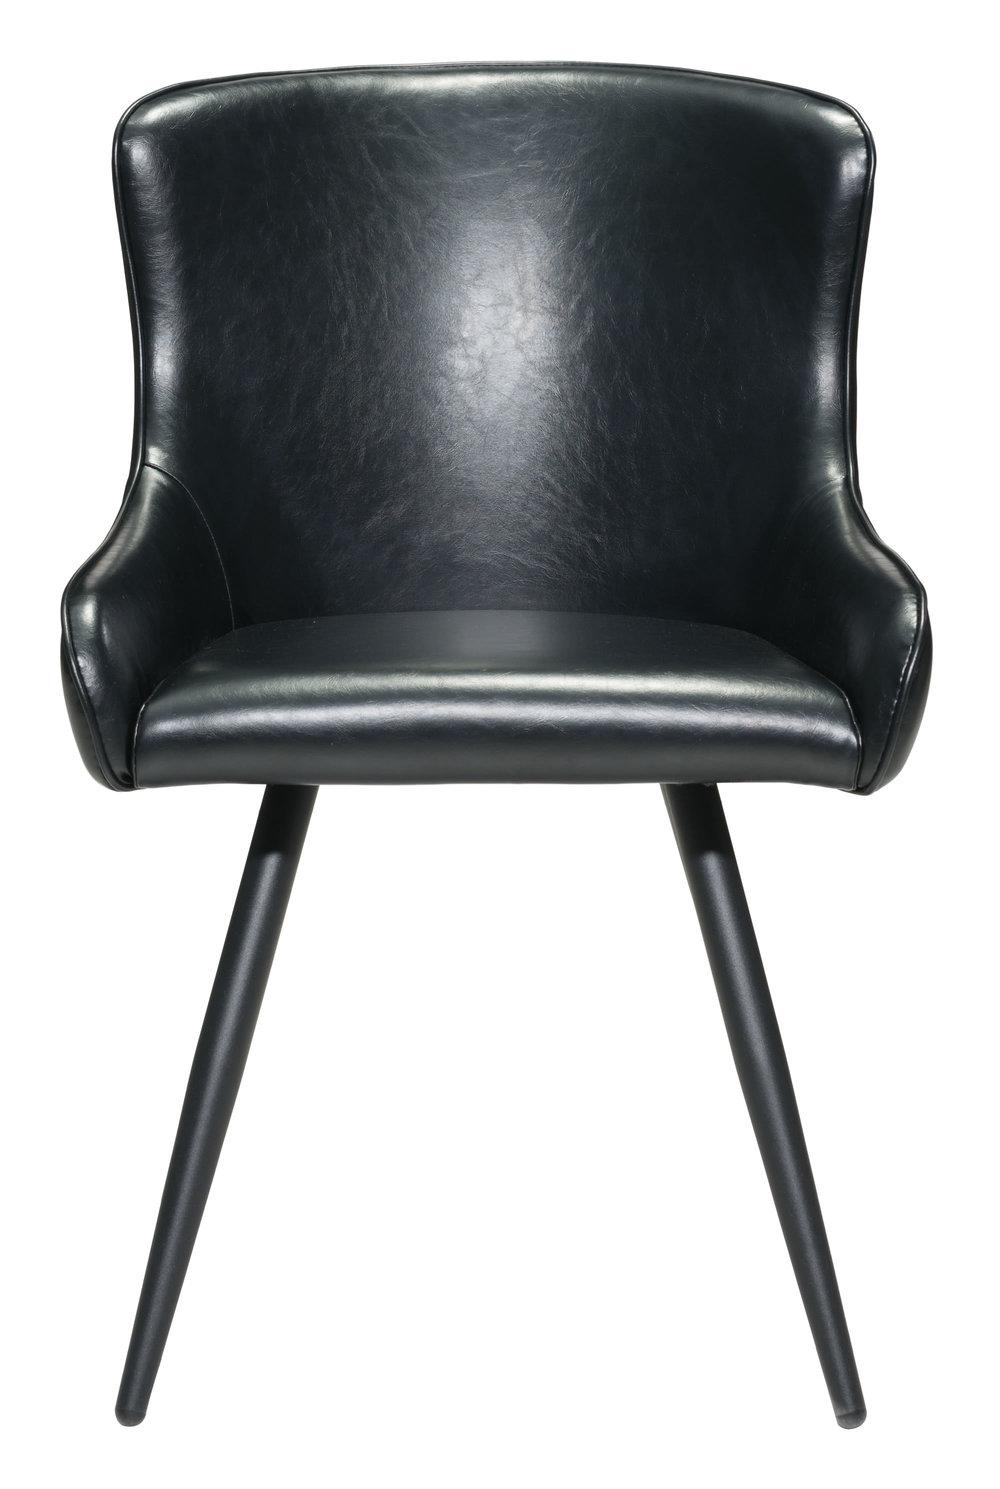 ZUO MODERN CONTEMPORARY, INC - Dresden Dining Chair - Set of 2 - Black